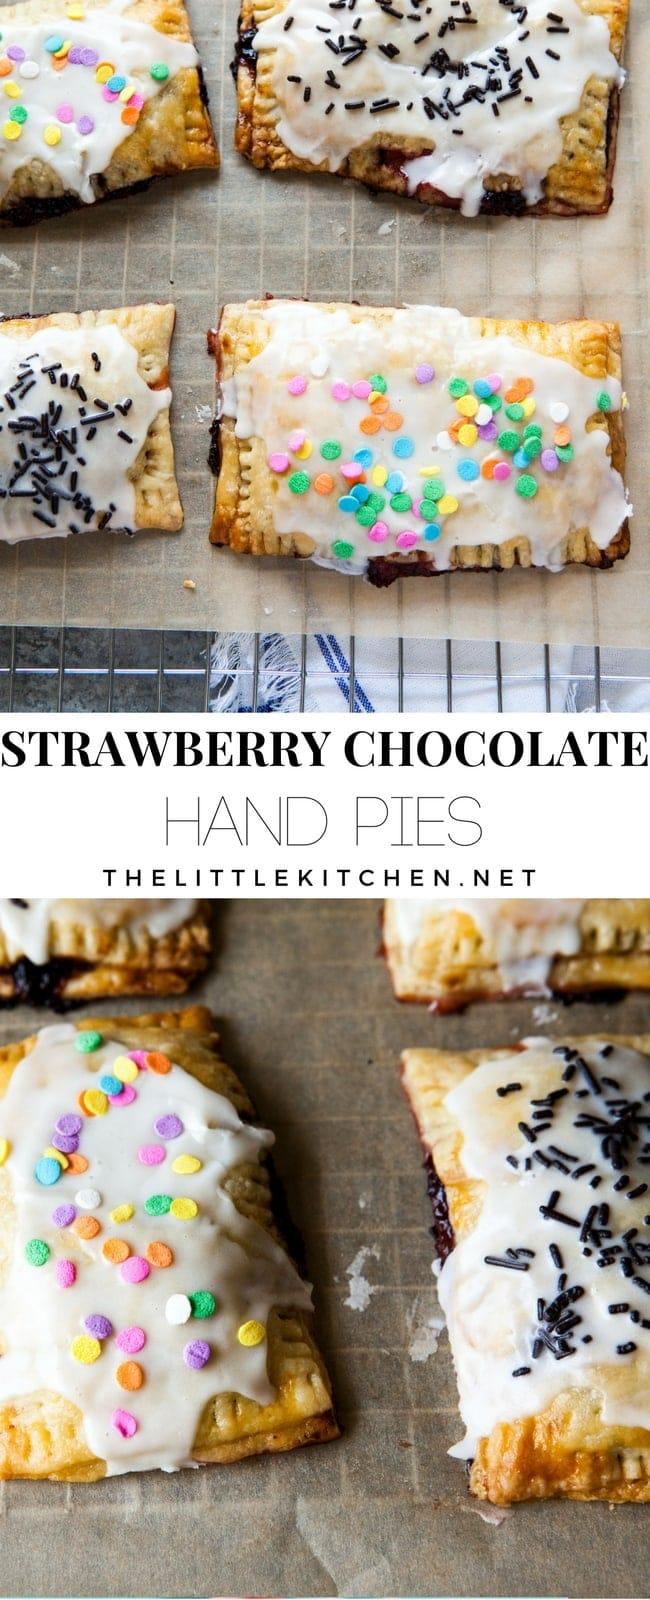 Strawberry Chocolate Hand Pies from thelittlekitchen.net